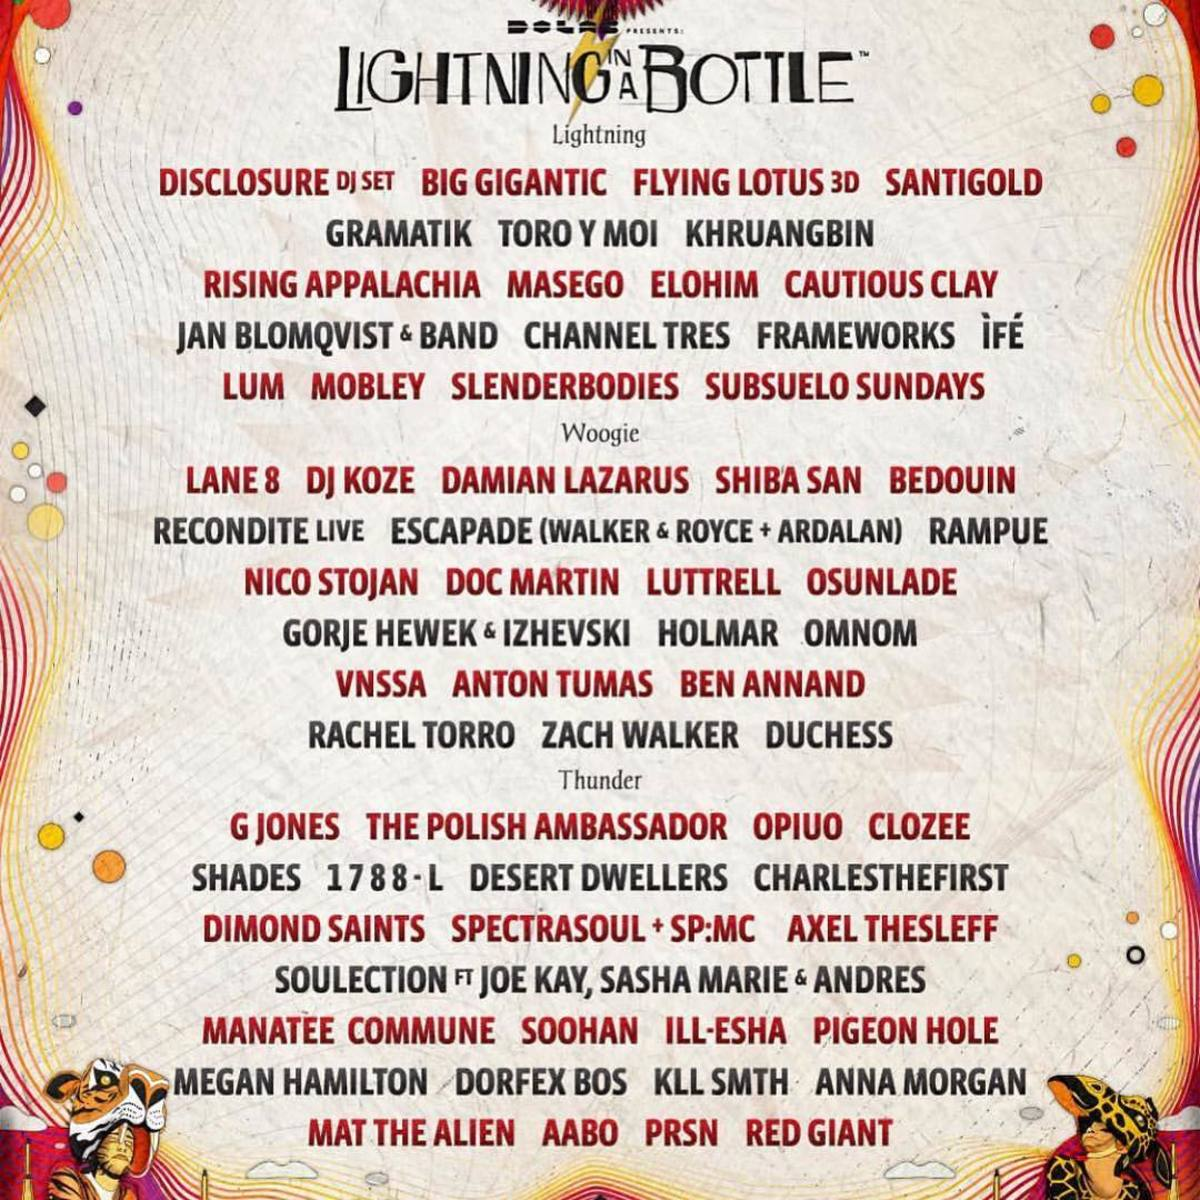 LIB 2019 lineup